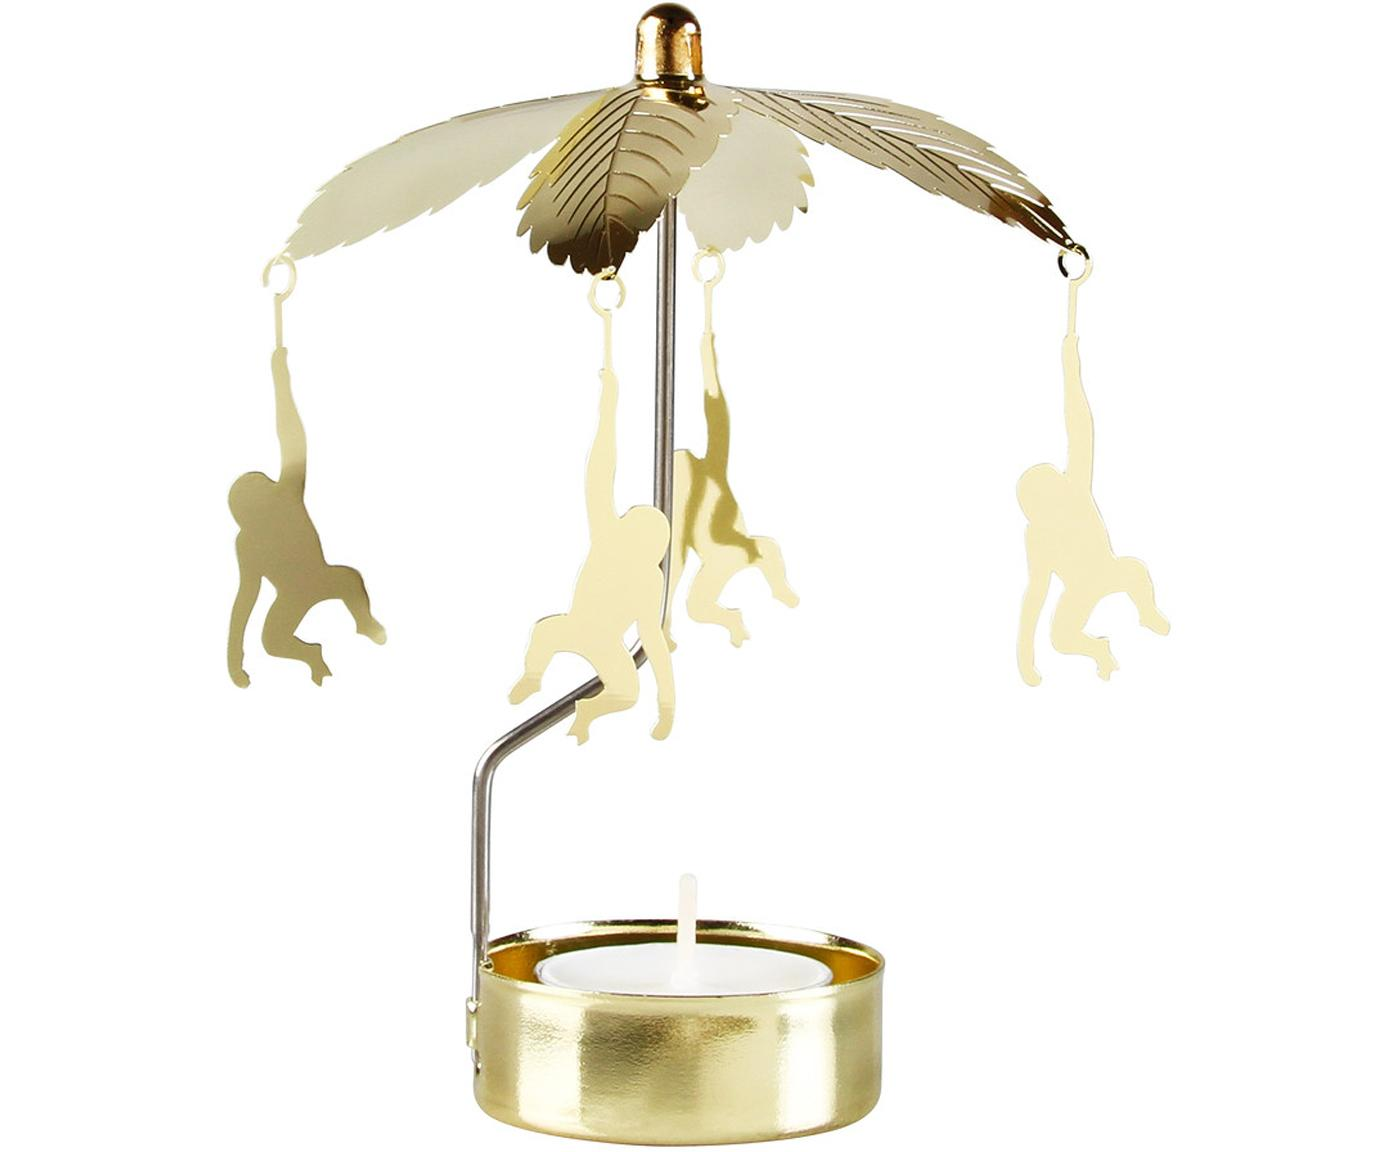 Waxinelichthouder Monkey-go-round, Gelakt aluminium, Messingkleurig, Ø 10 x H 14 cm